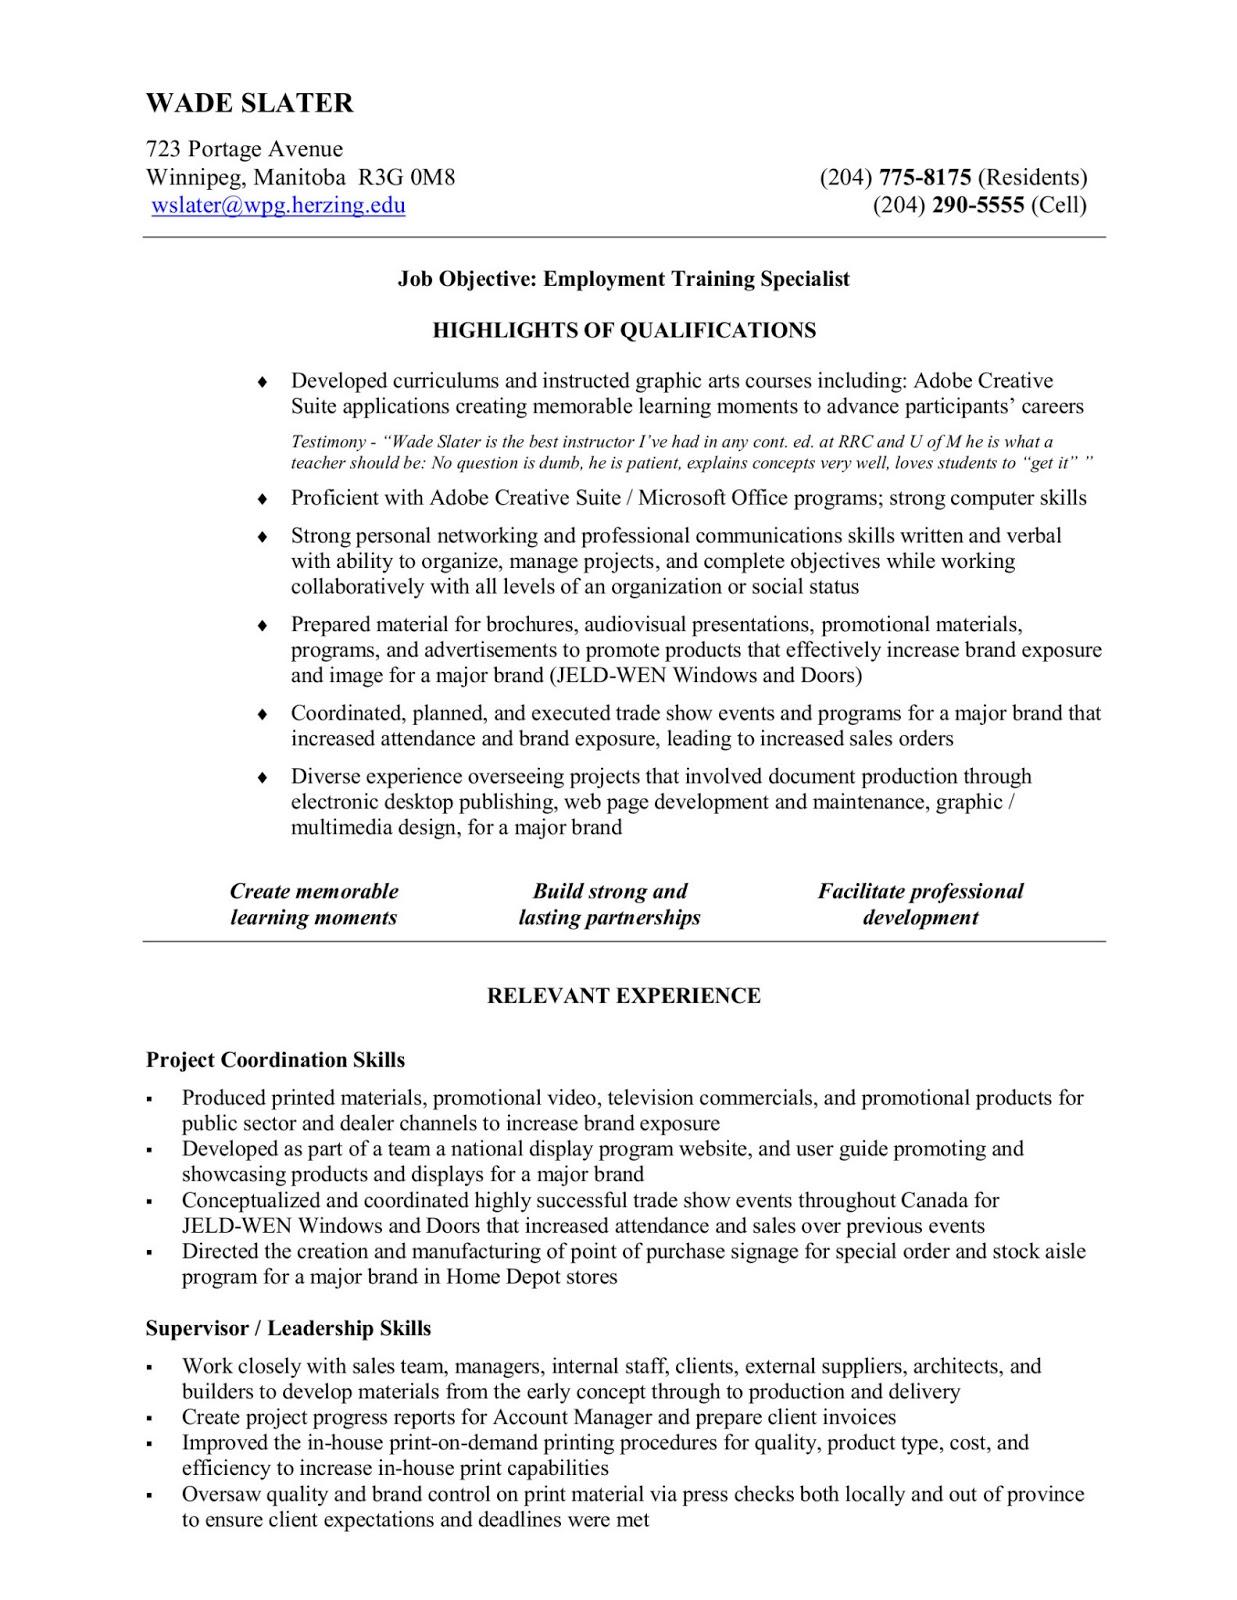 Resume Examples | Wade Slater - Career Development